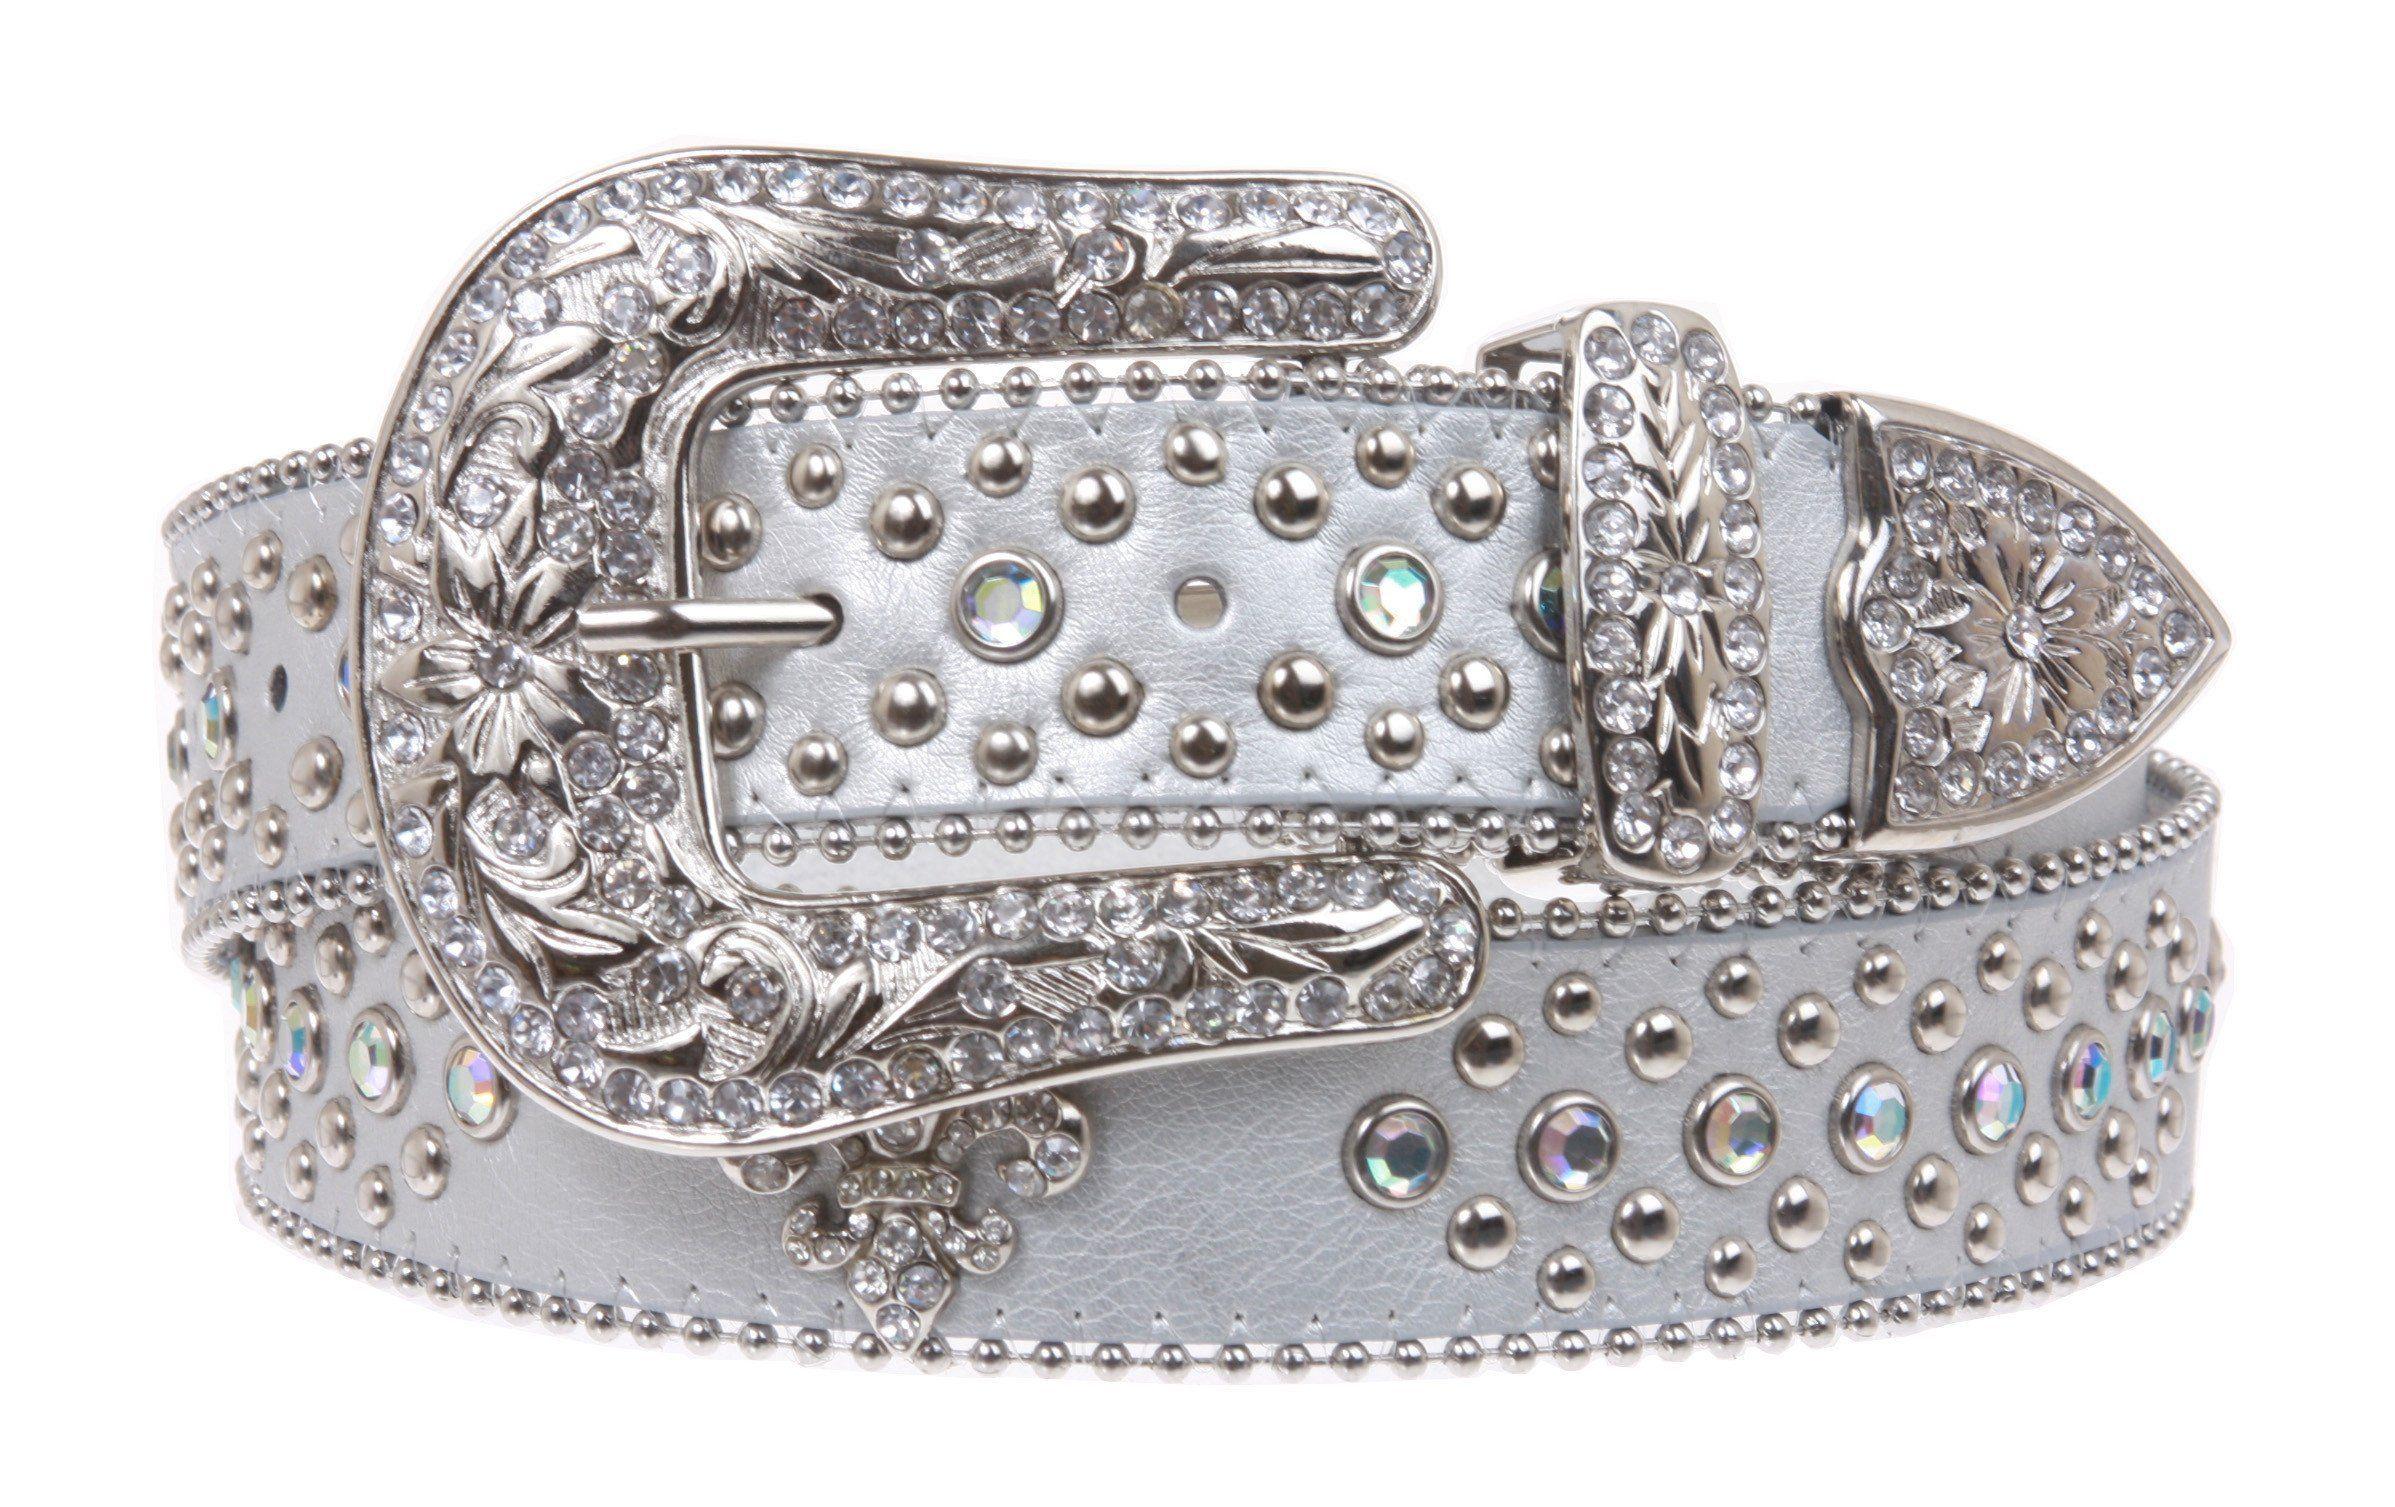 Ladies Western Rhinestone Silver Circle Studs and Fleur De Lis Ornaments Genuine Leather Belt